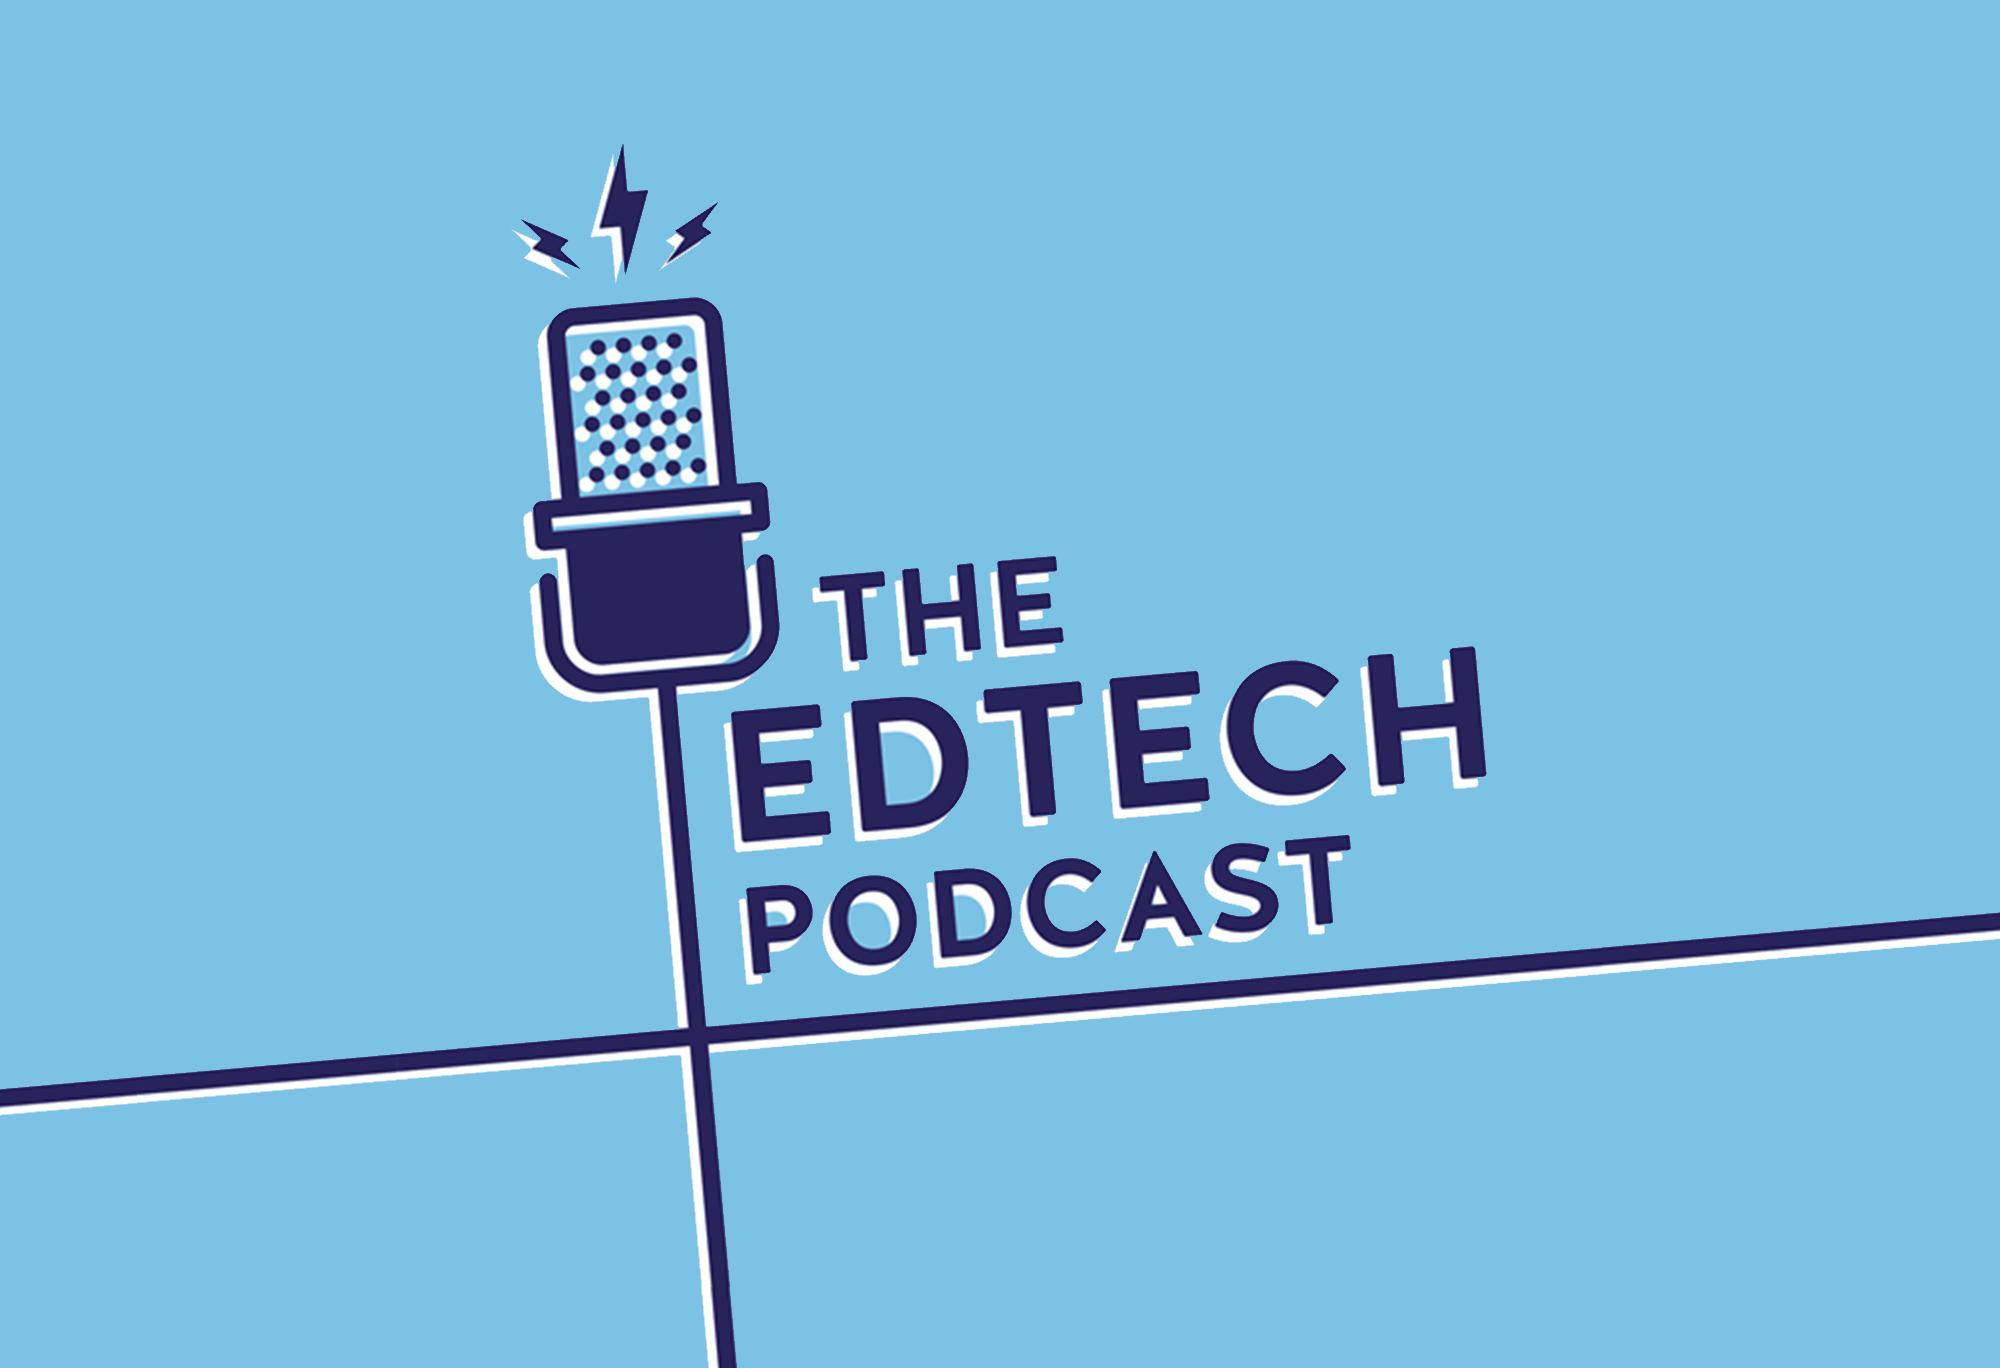 The Edtech Podcast